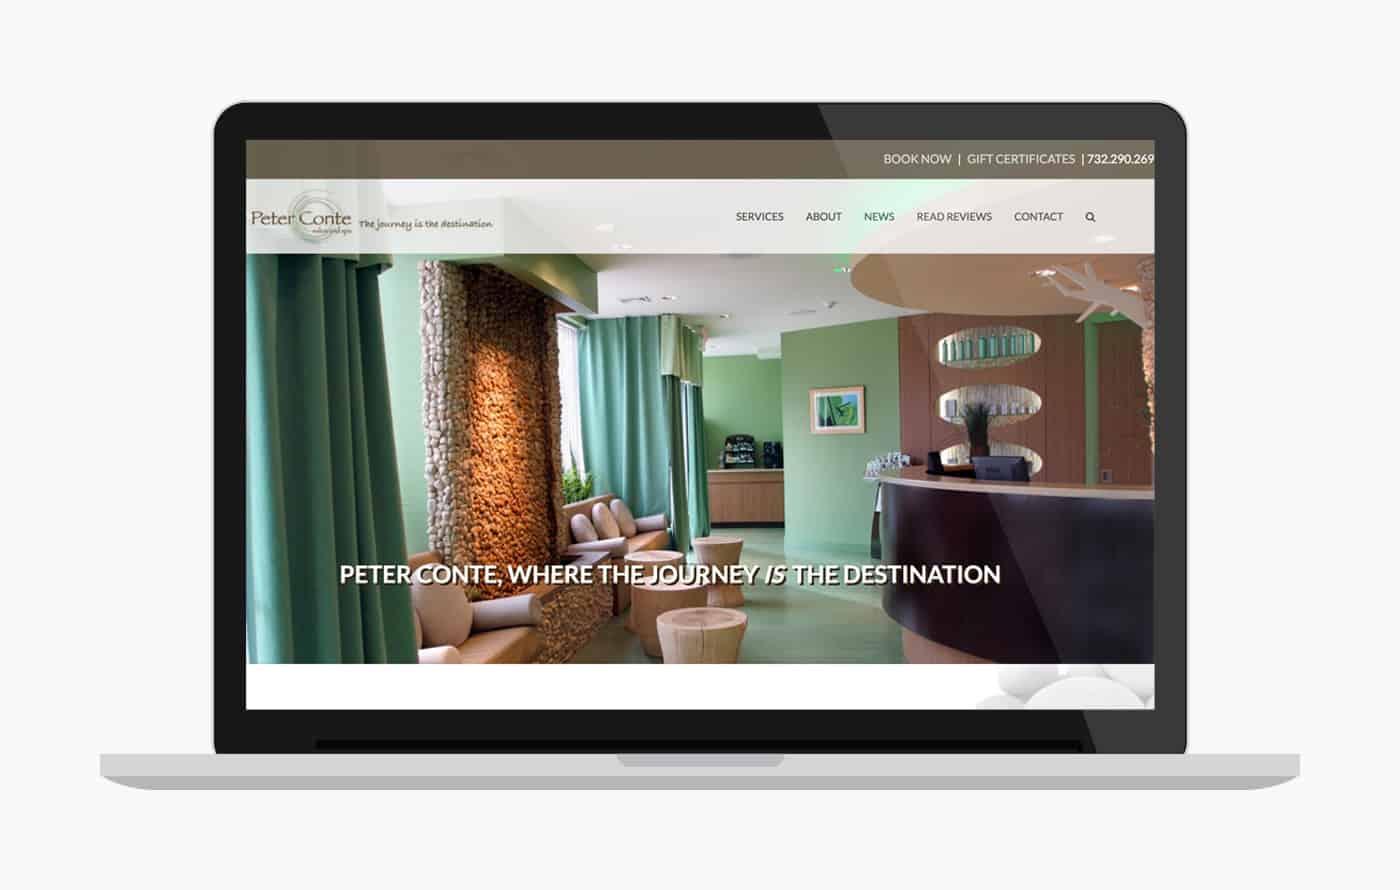 Hair Salon Website Design - Peter Conte